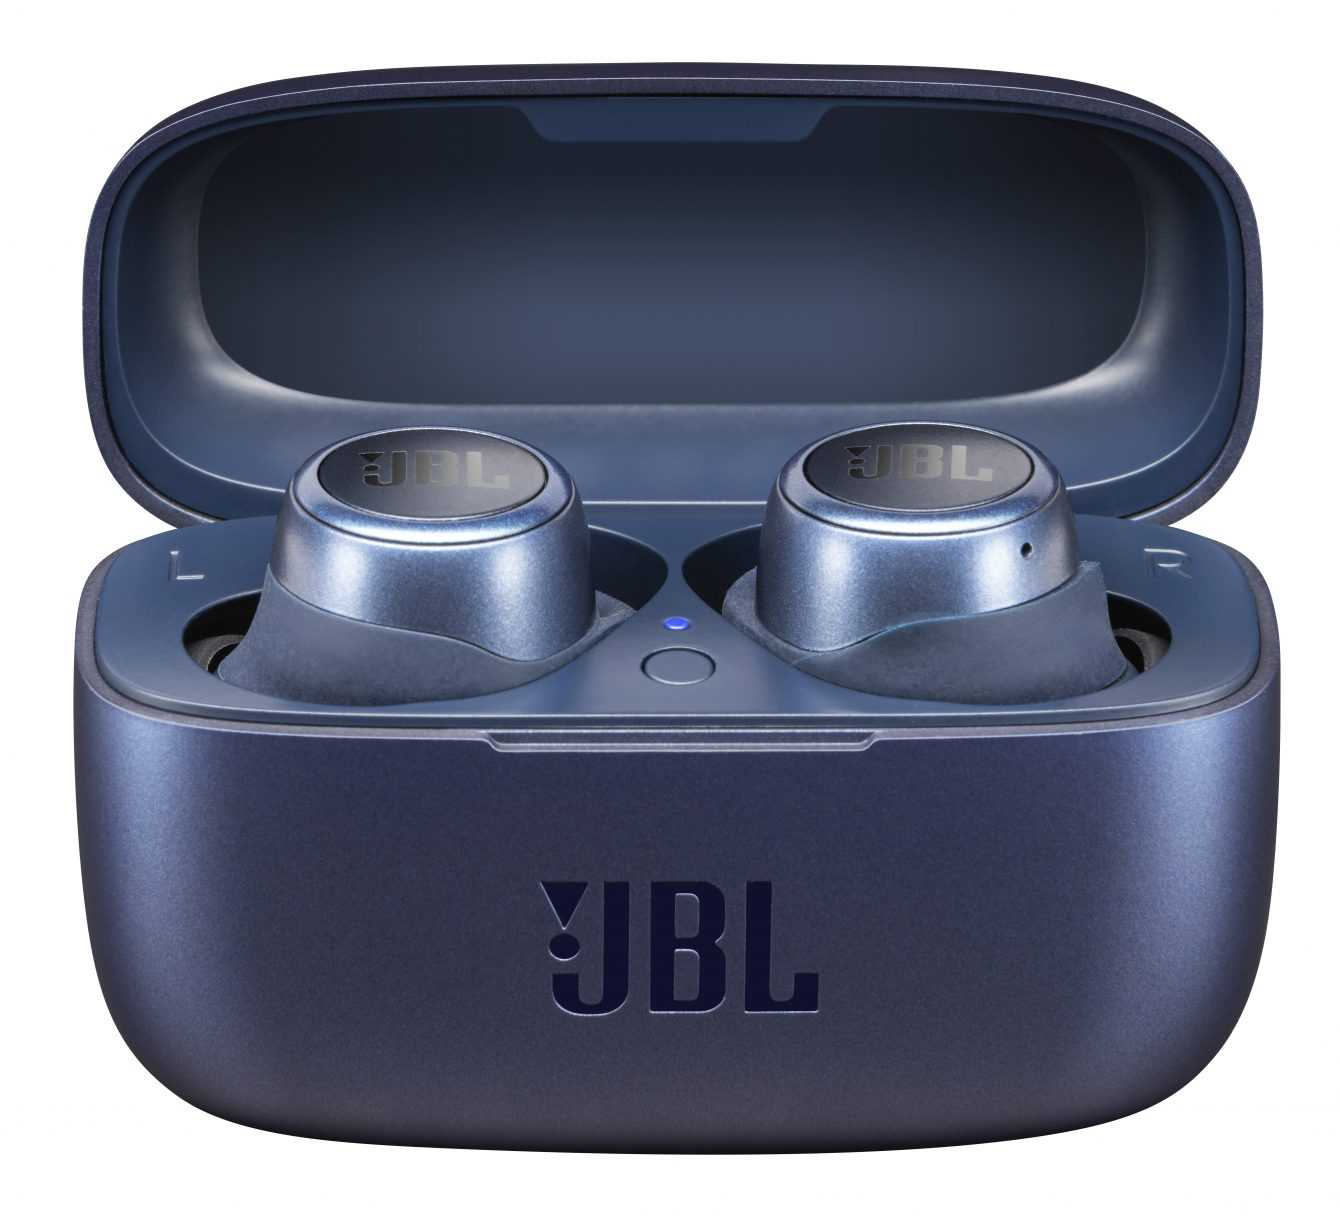 JBL: presentati i nuovi auricolari true wireless LIVE 300TWS